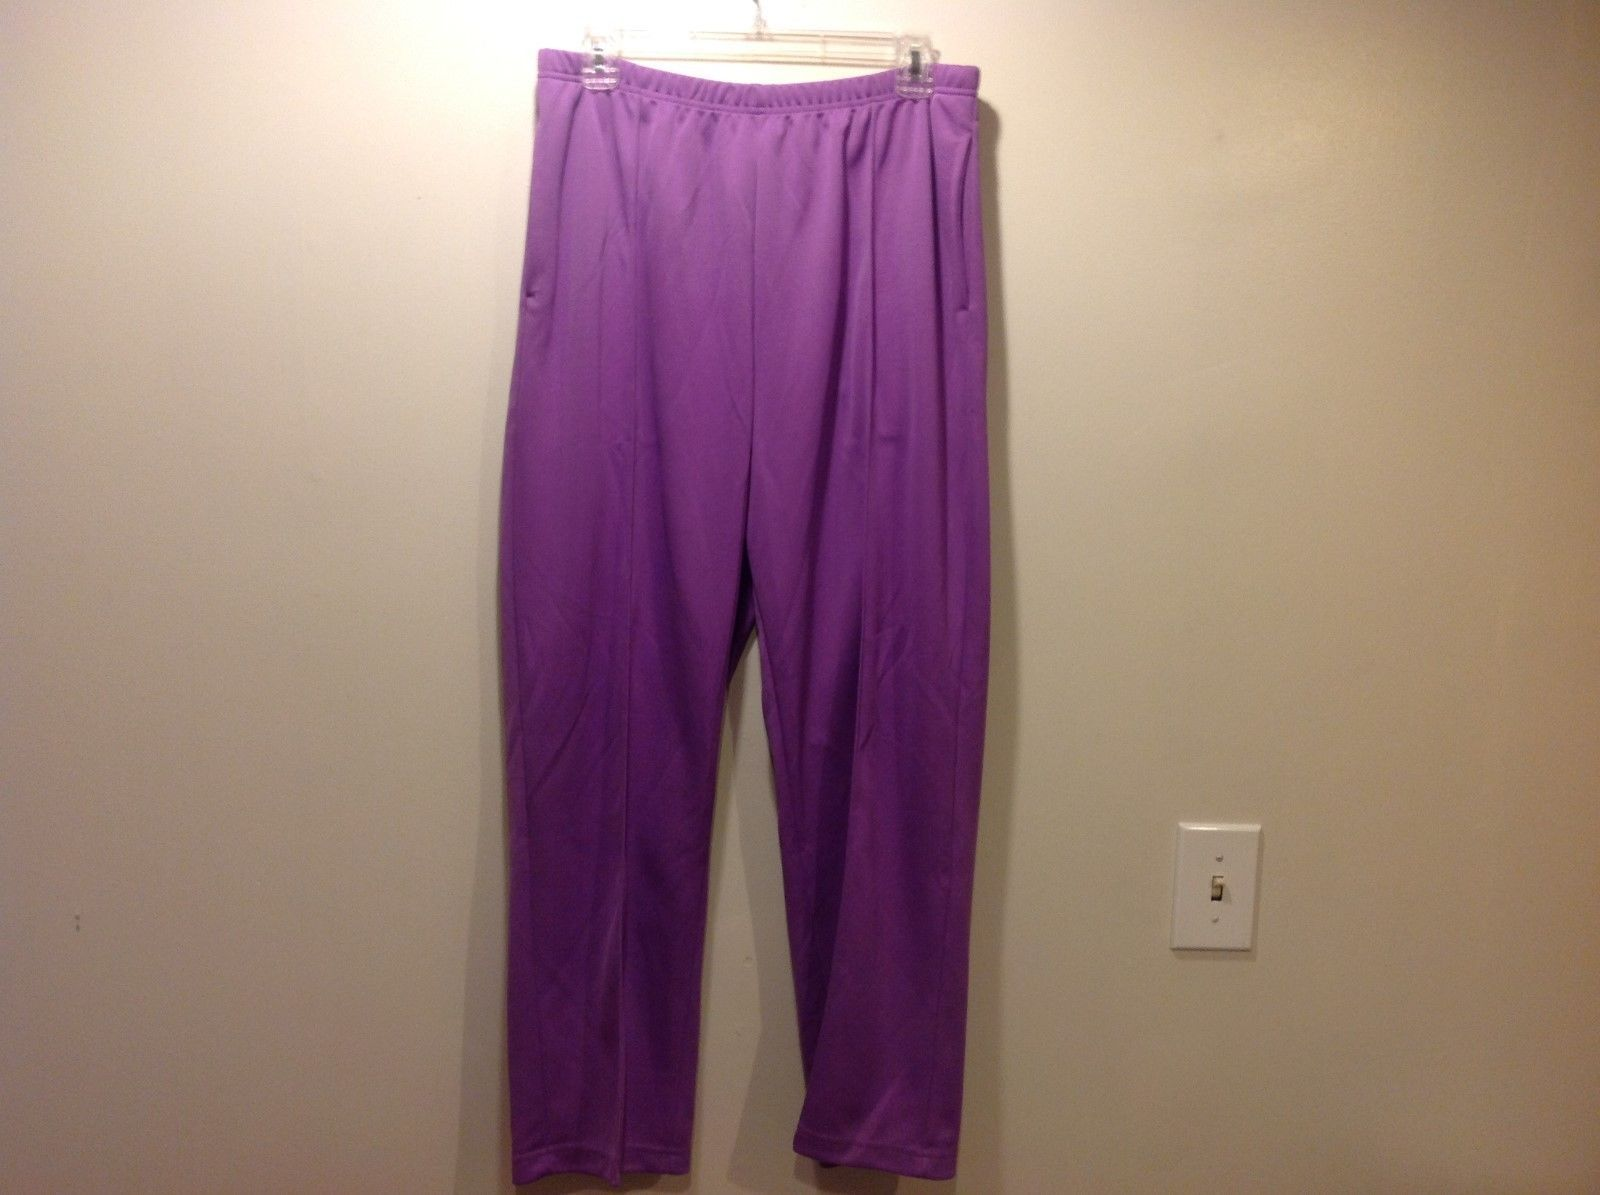 Ladies Lavender Colored Pants w Elastic Waist by Sara Morgan Sz 16P